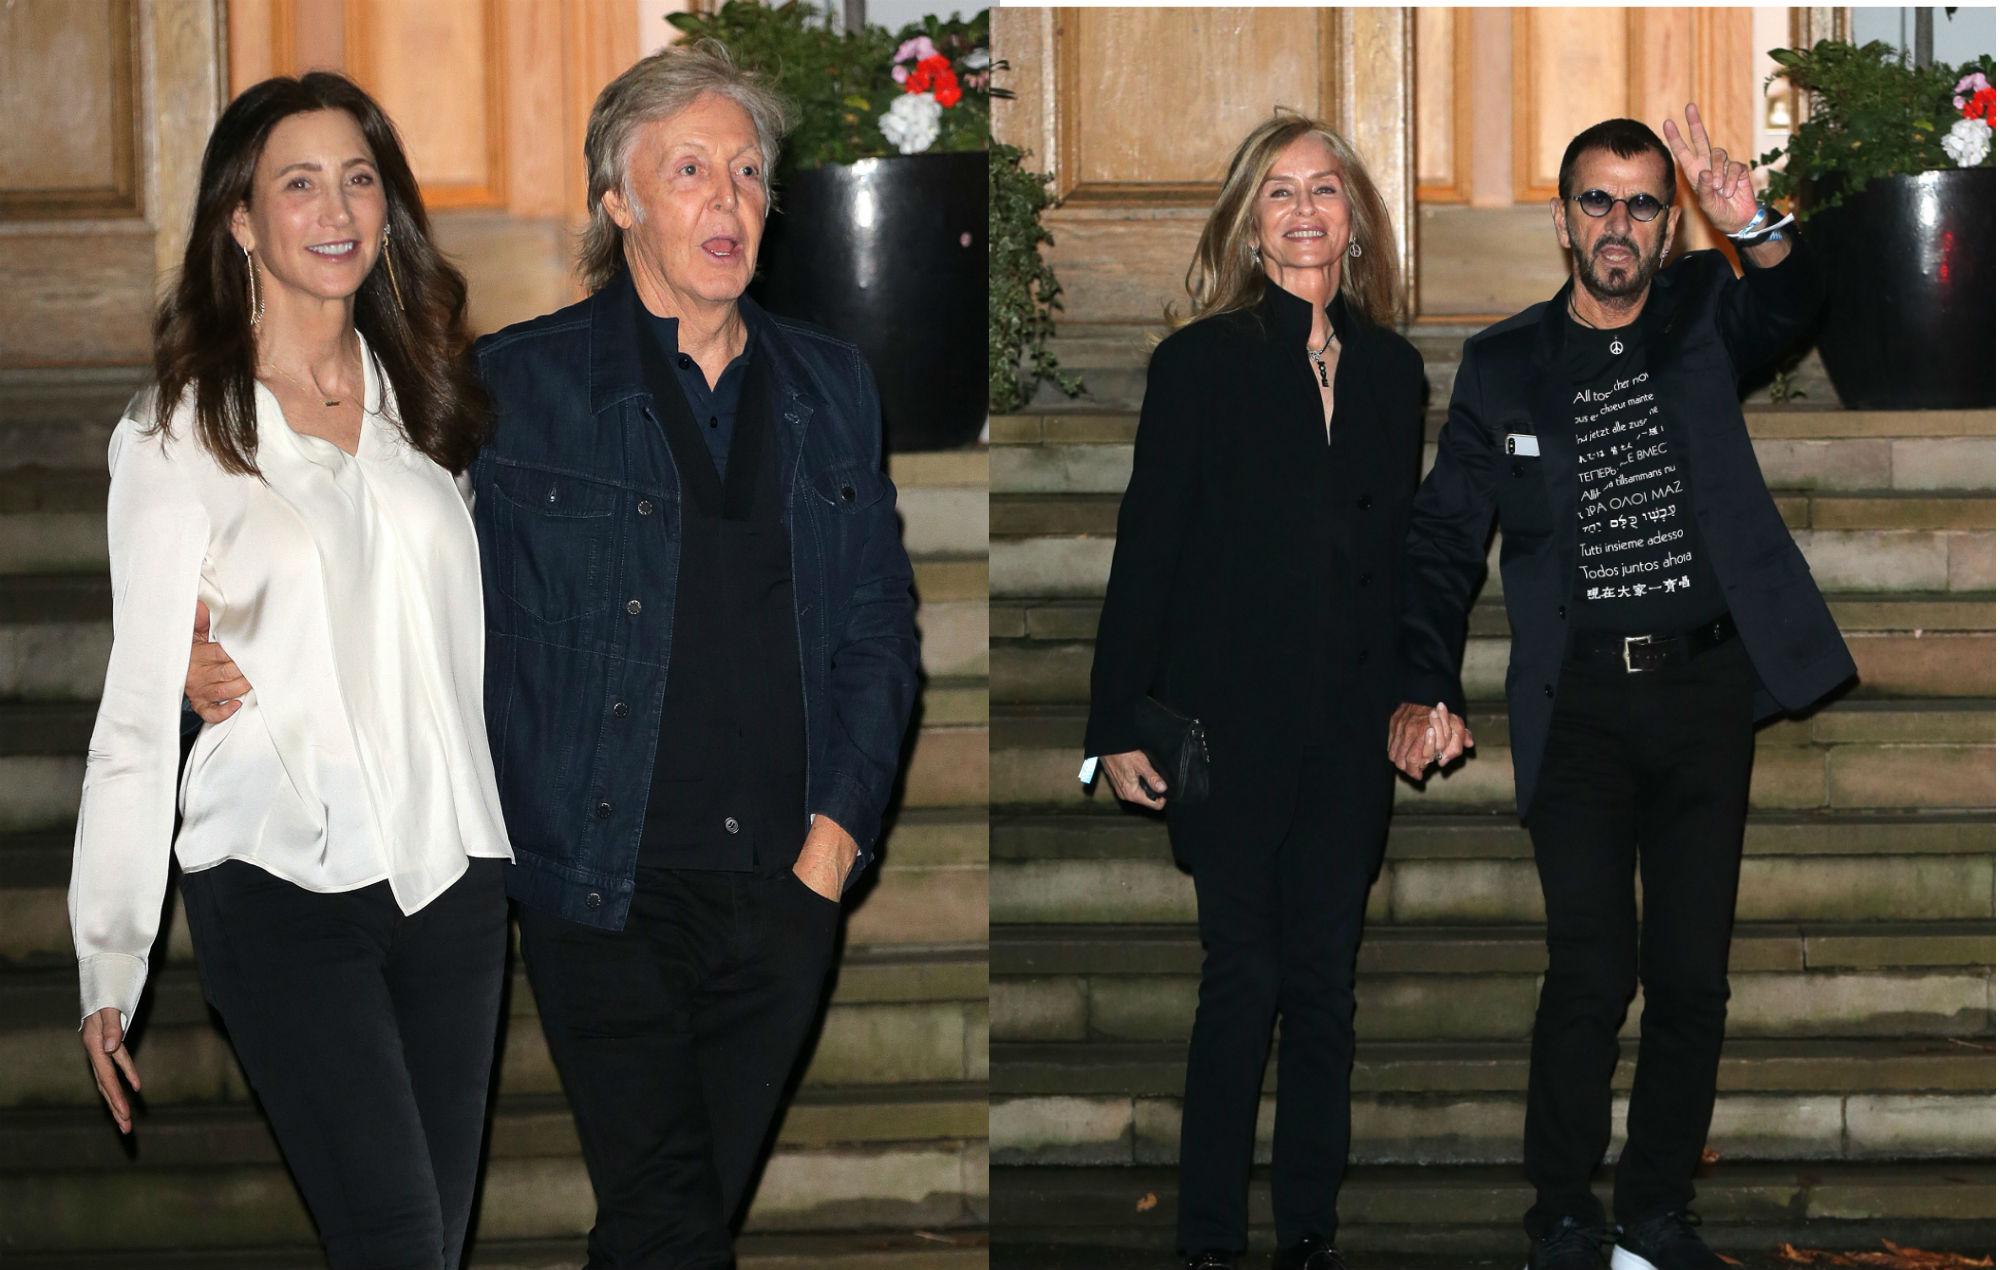 Paul Mccartney And Ringo Starr Reunite At Abbey Road